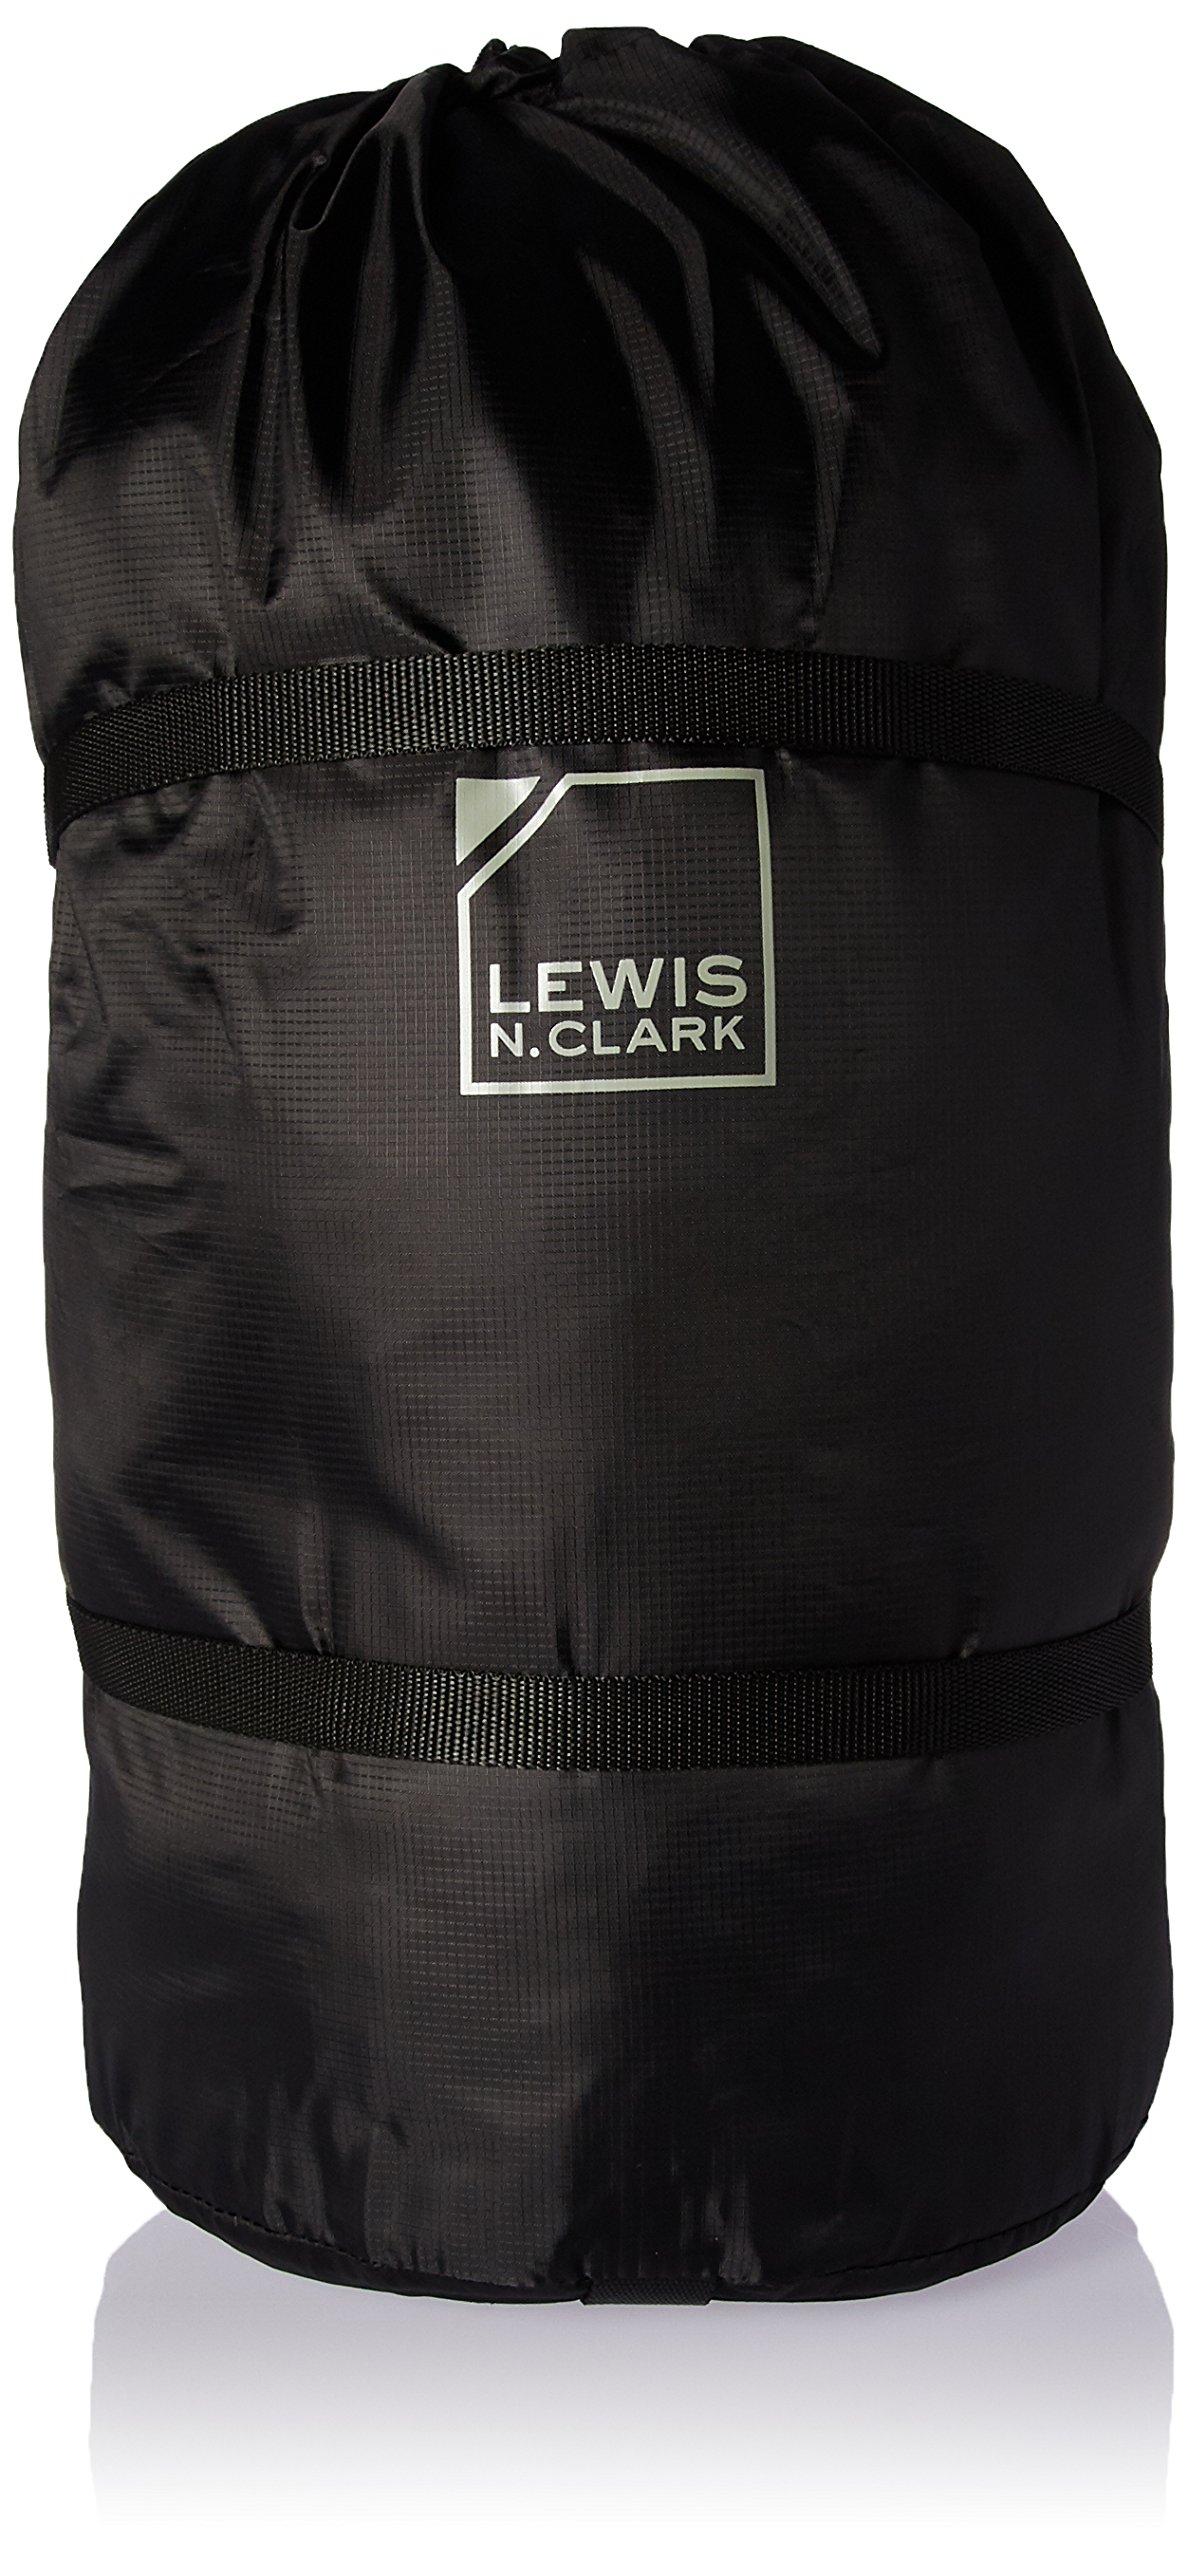 Lewis N. Clark Compression Bag 10'' X 20'' Drawstring, Black, One Size